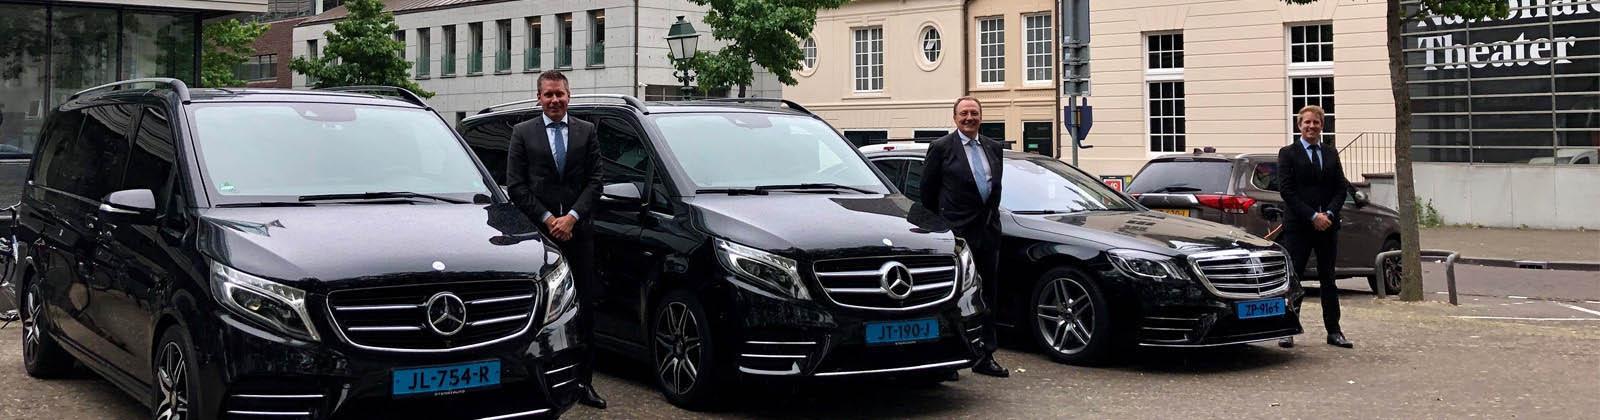 Limousine-service-Brussels